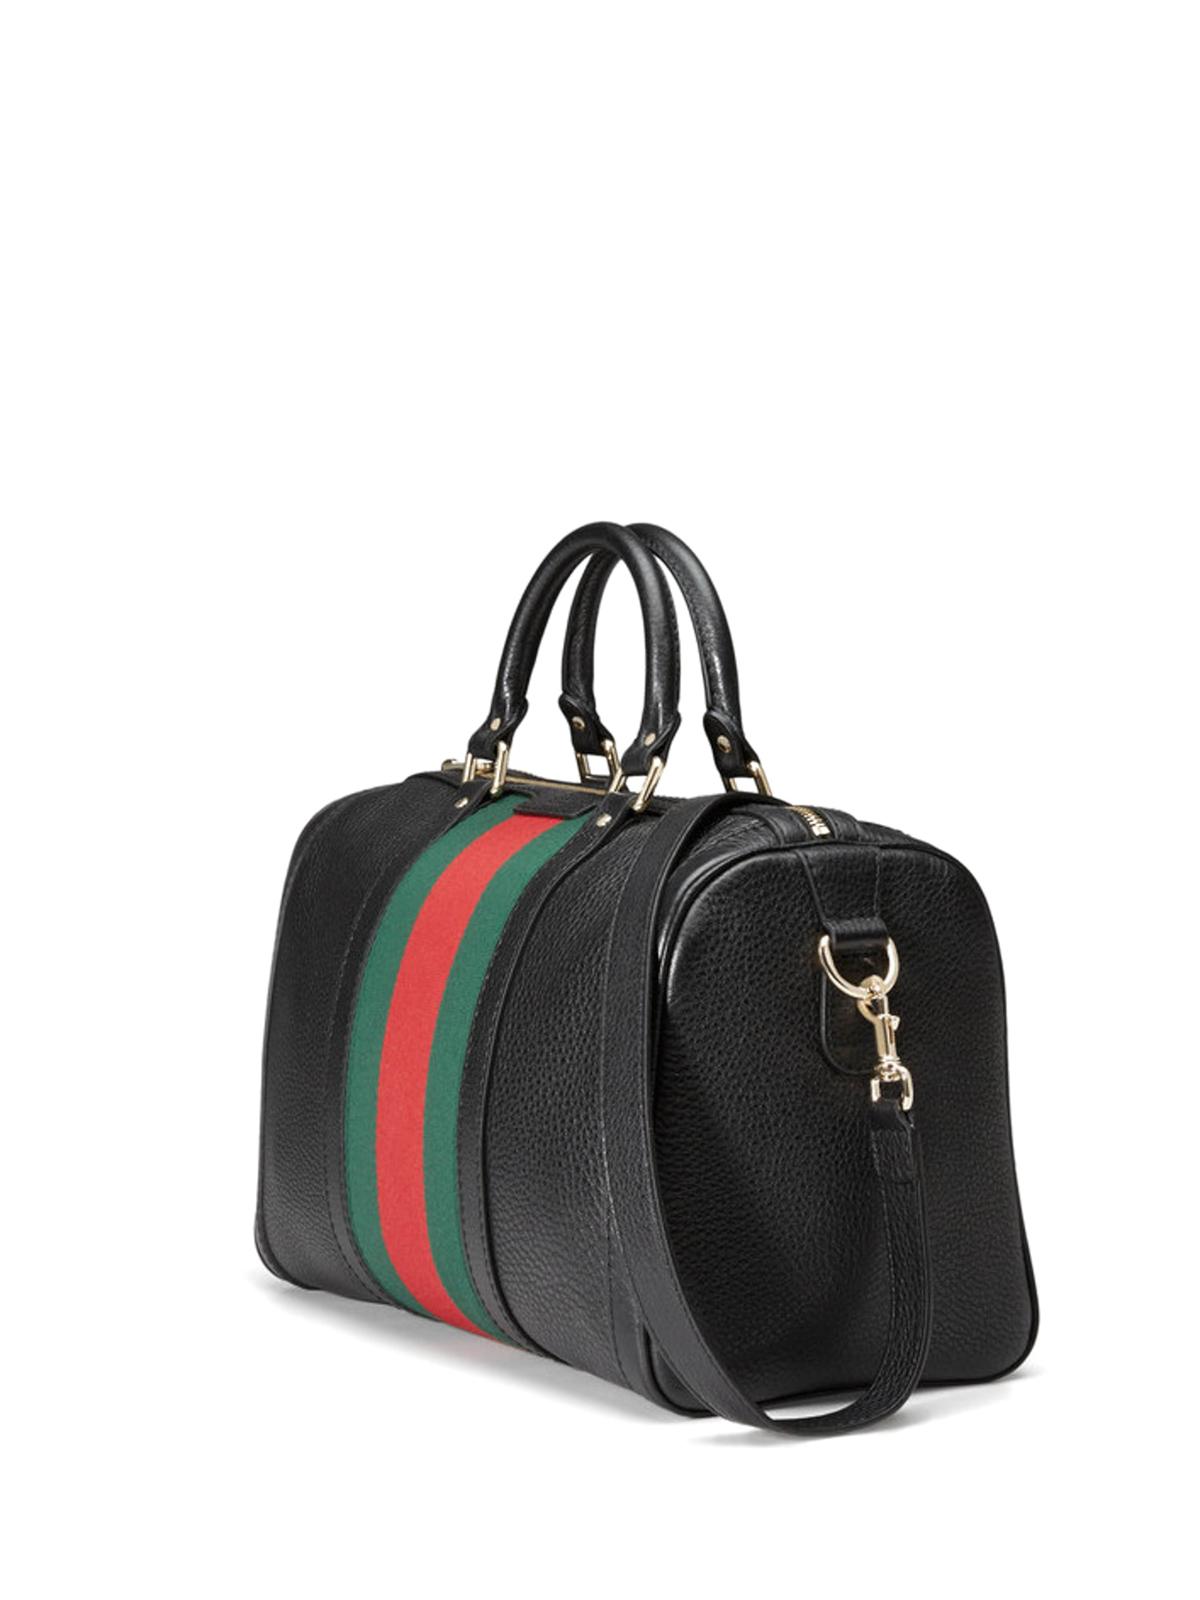 8bef81b8a23c Gucci - Vintage Web boston bag - bowling bags - 247205A7MAG1060